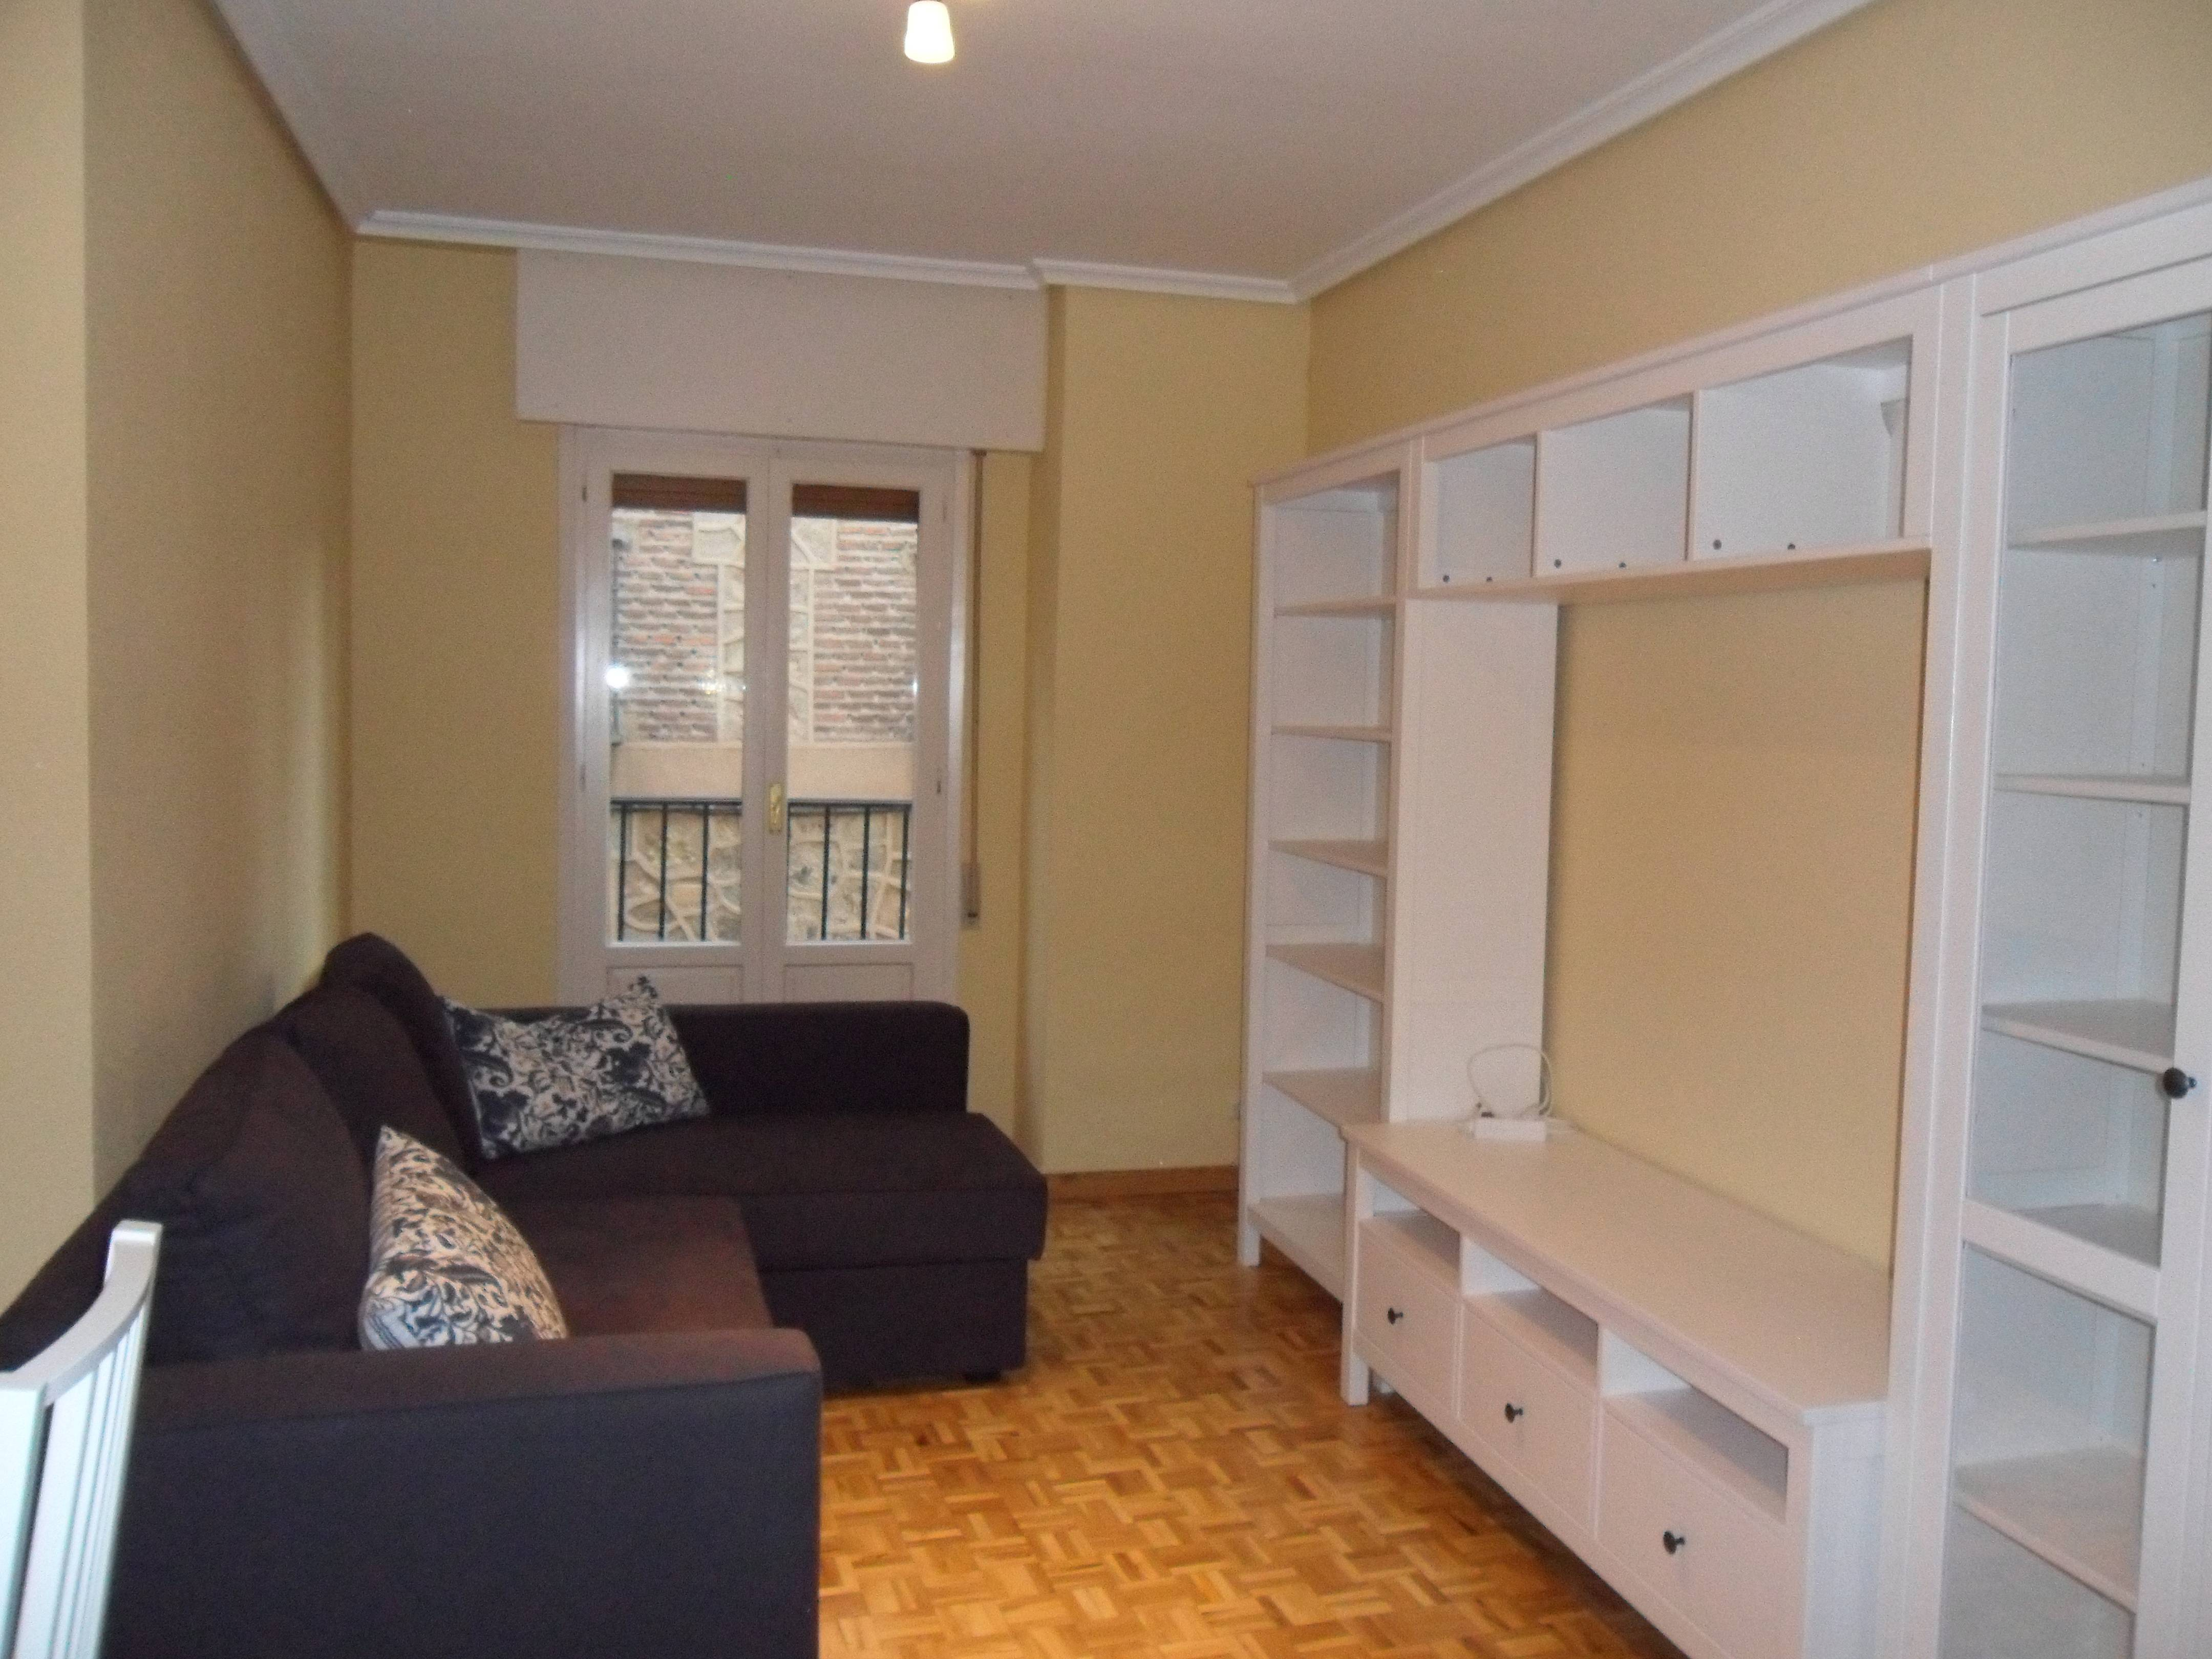 Apartamento en alquiler en segovia segovia segovia camino de santiago de madrid - Alquiler apartamentos segovia ...